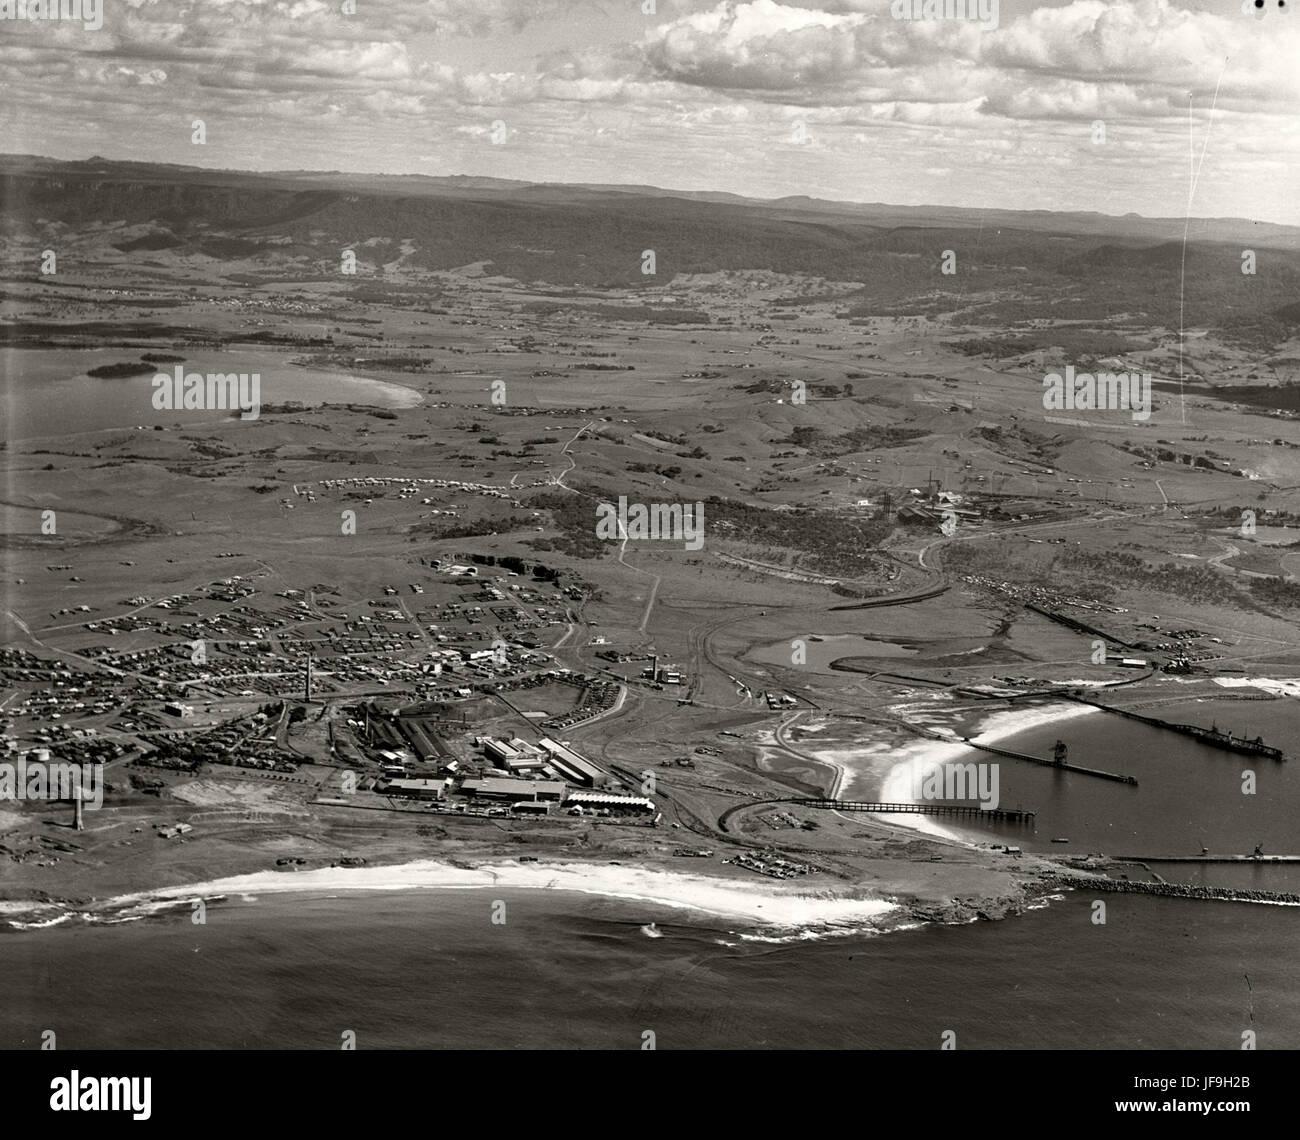 Port Kembla - 1936 29536105653 o - Stock Image